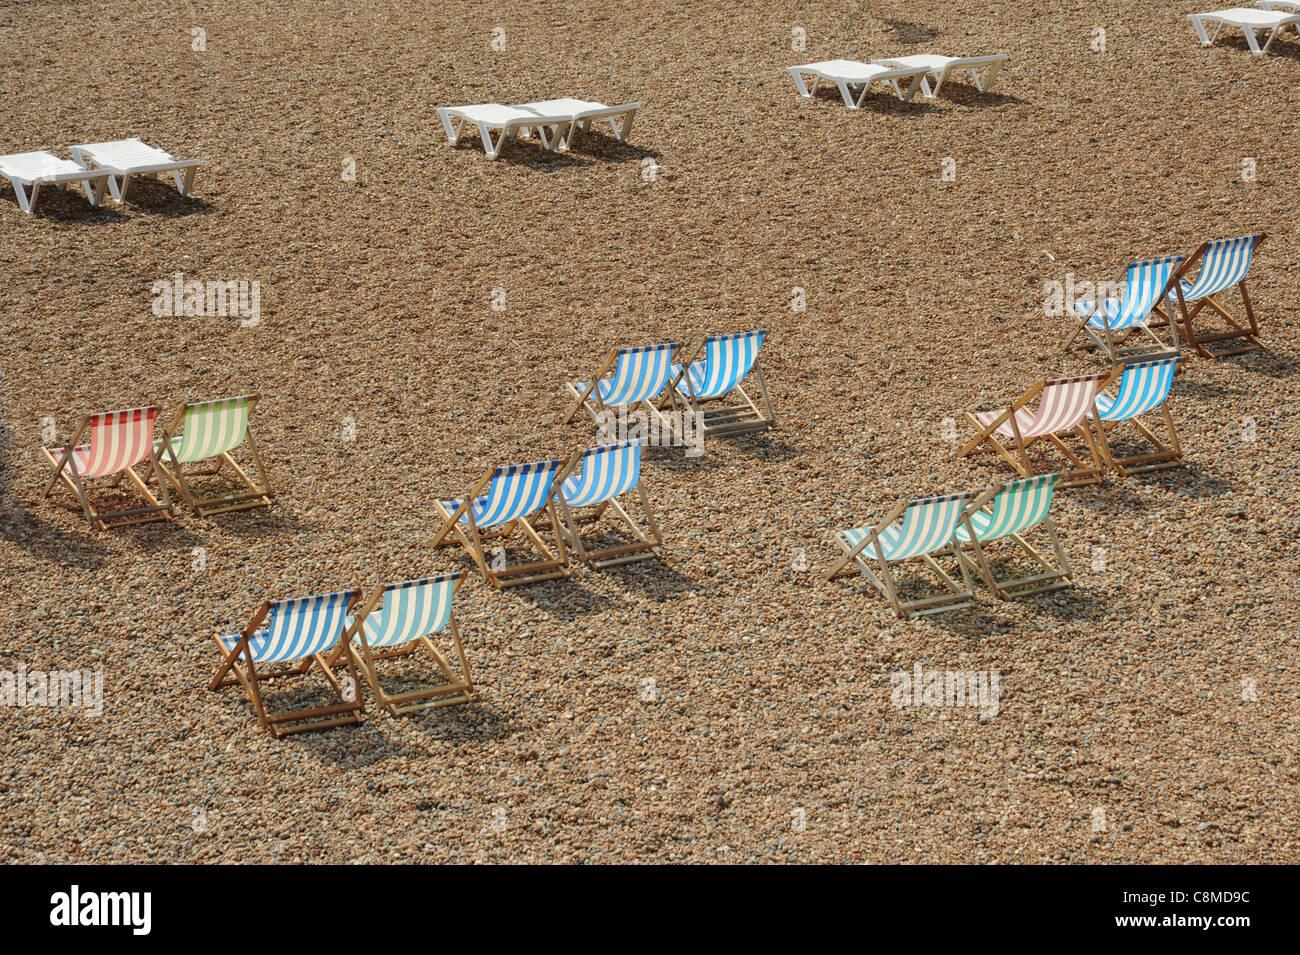 Deck chairs on a coastal beach - Stock Image